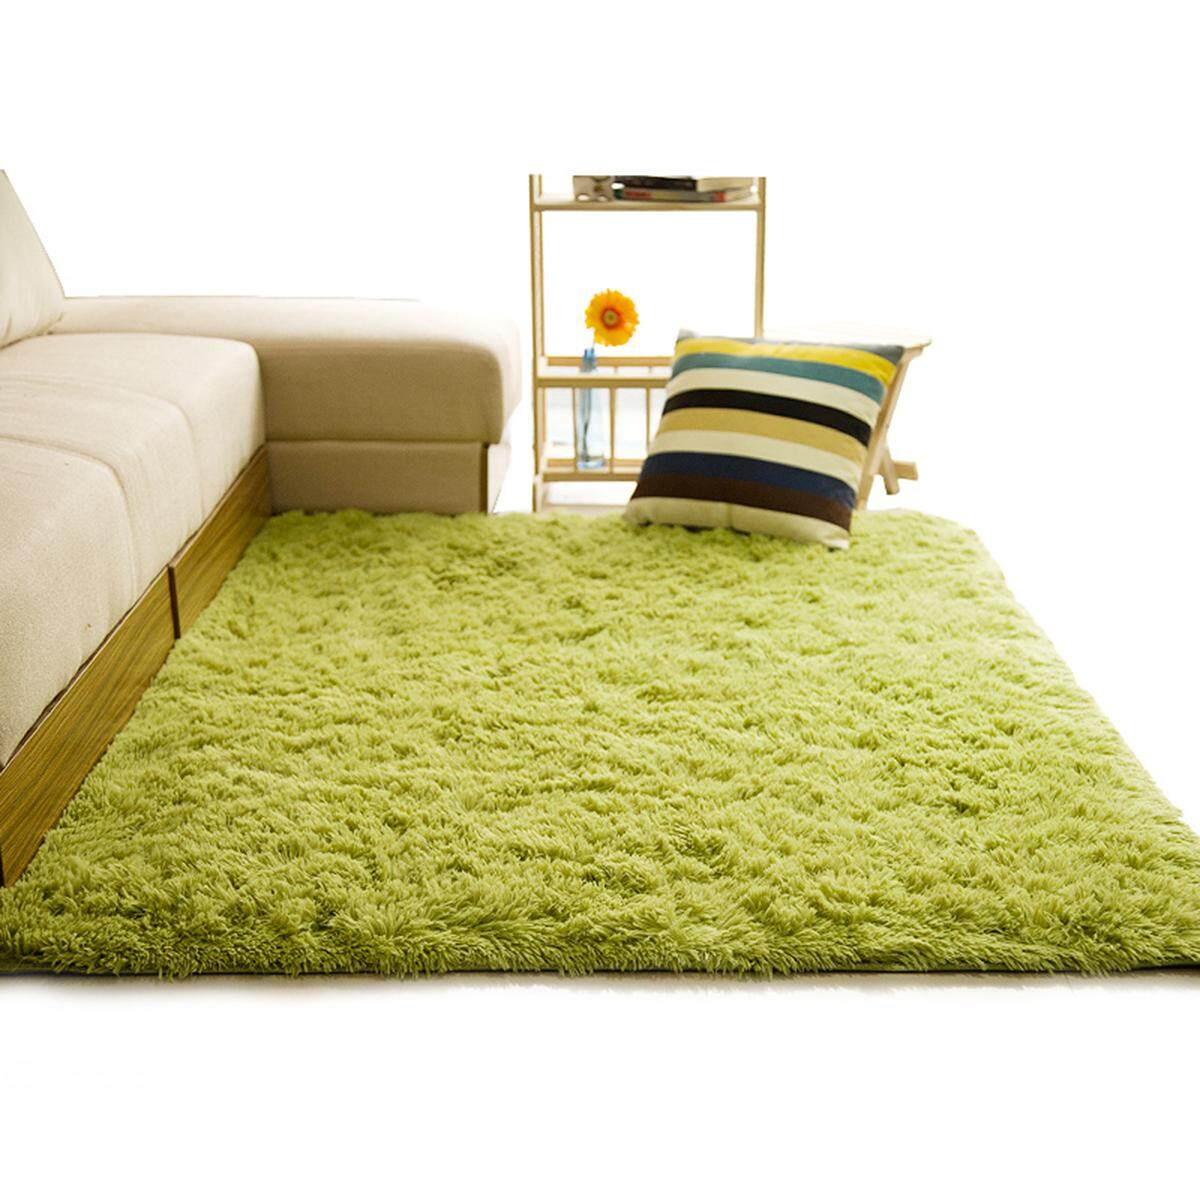 Lembut Karpet Berbulu Kusut untuk Ruang Keluarga Rumah Eropa Hangat Plush Karpet Lantai Matras Berbulu Kamar